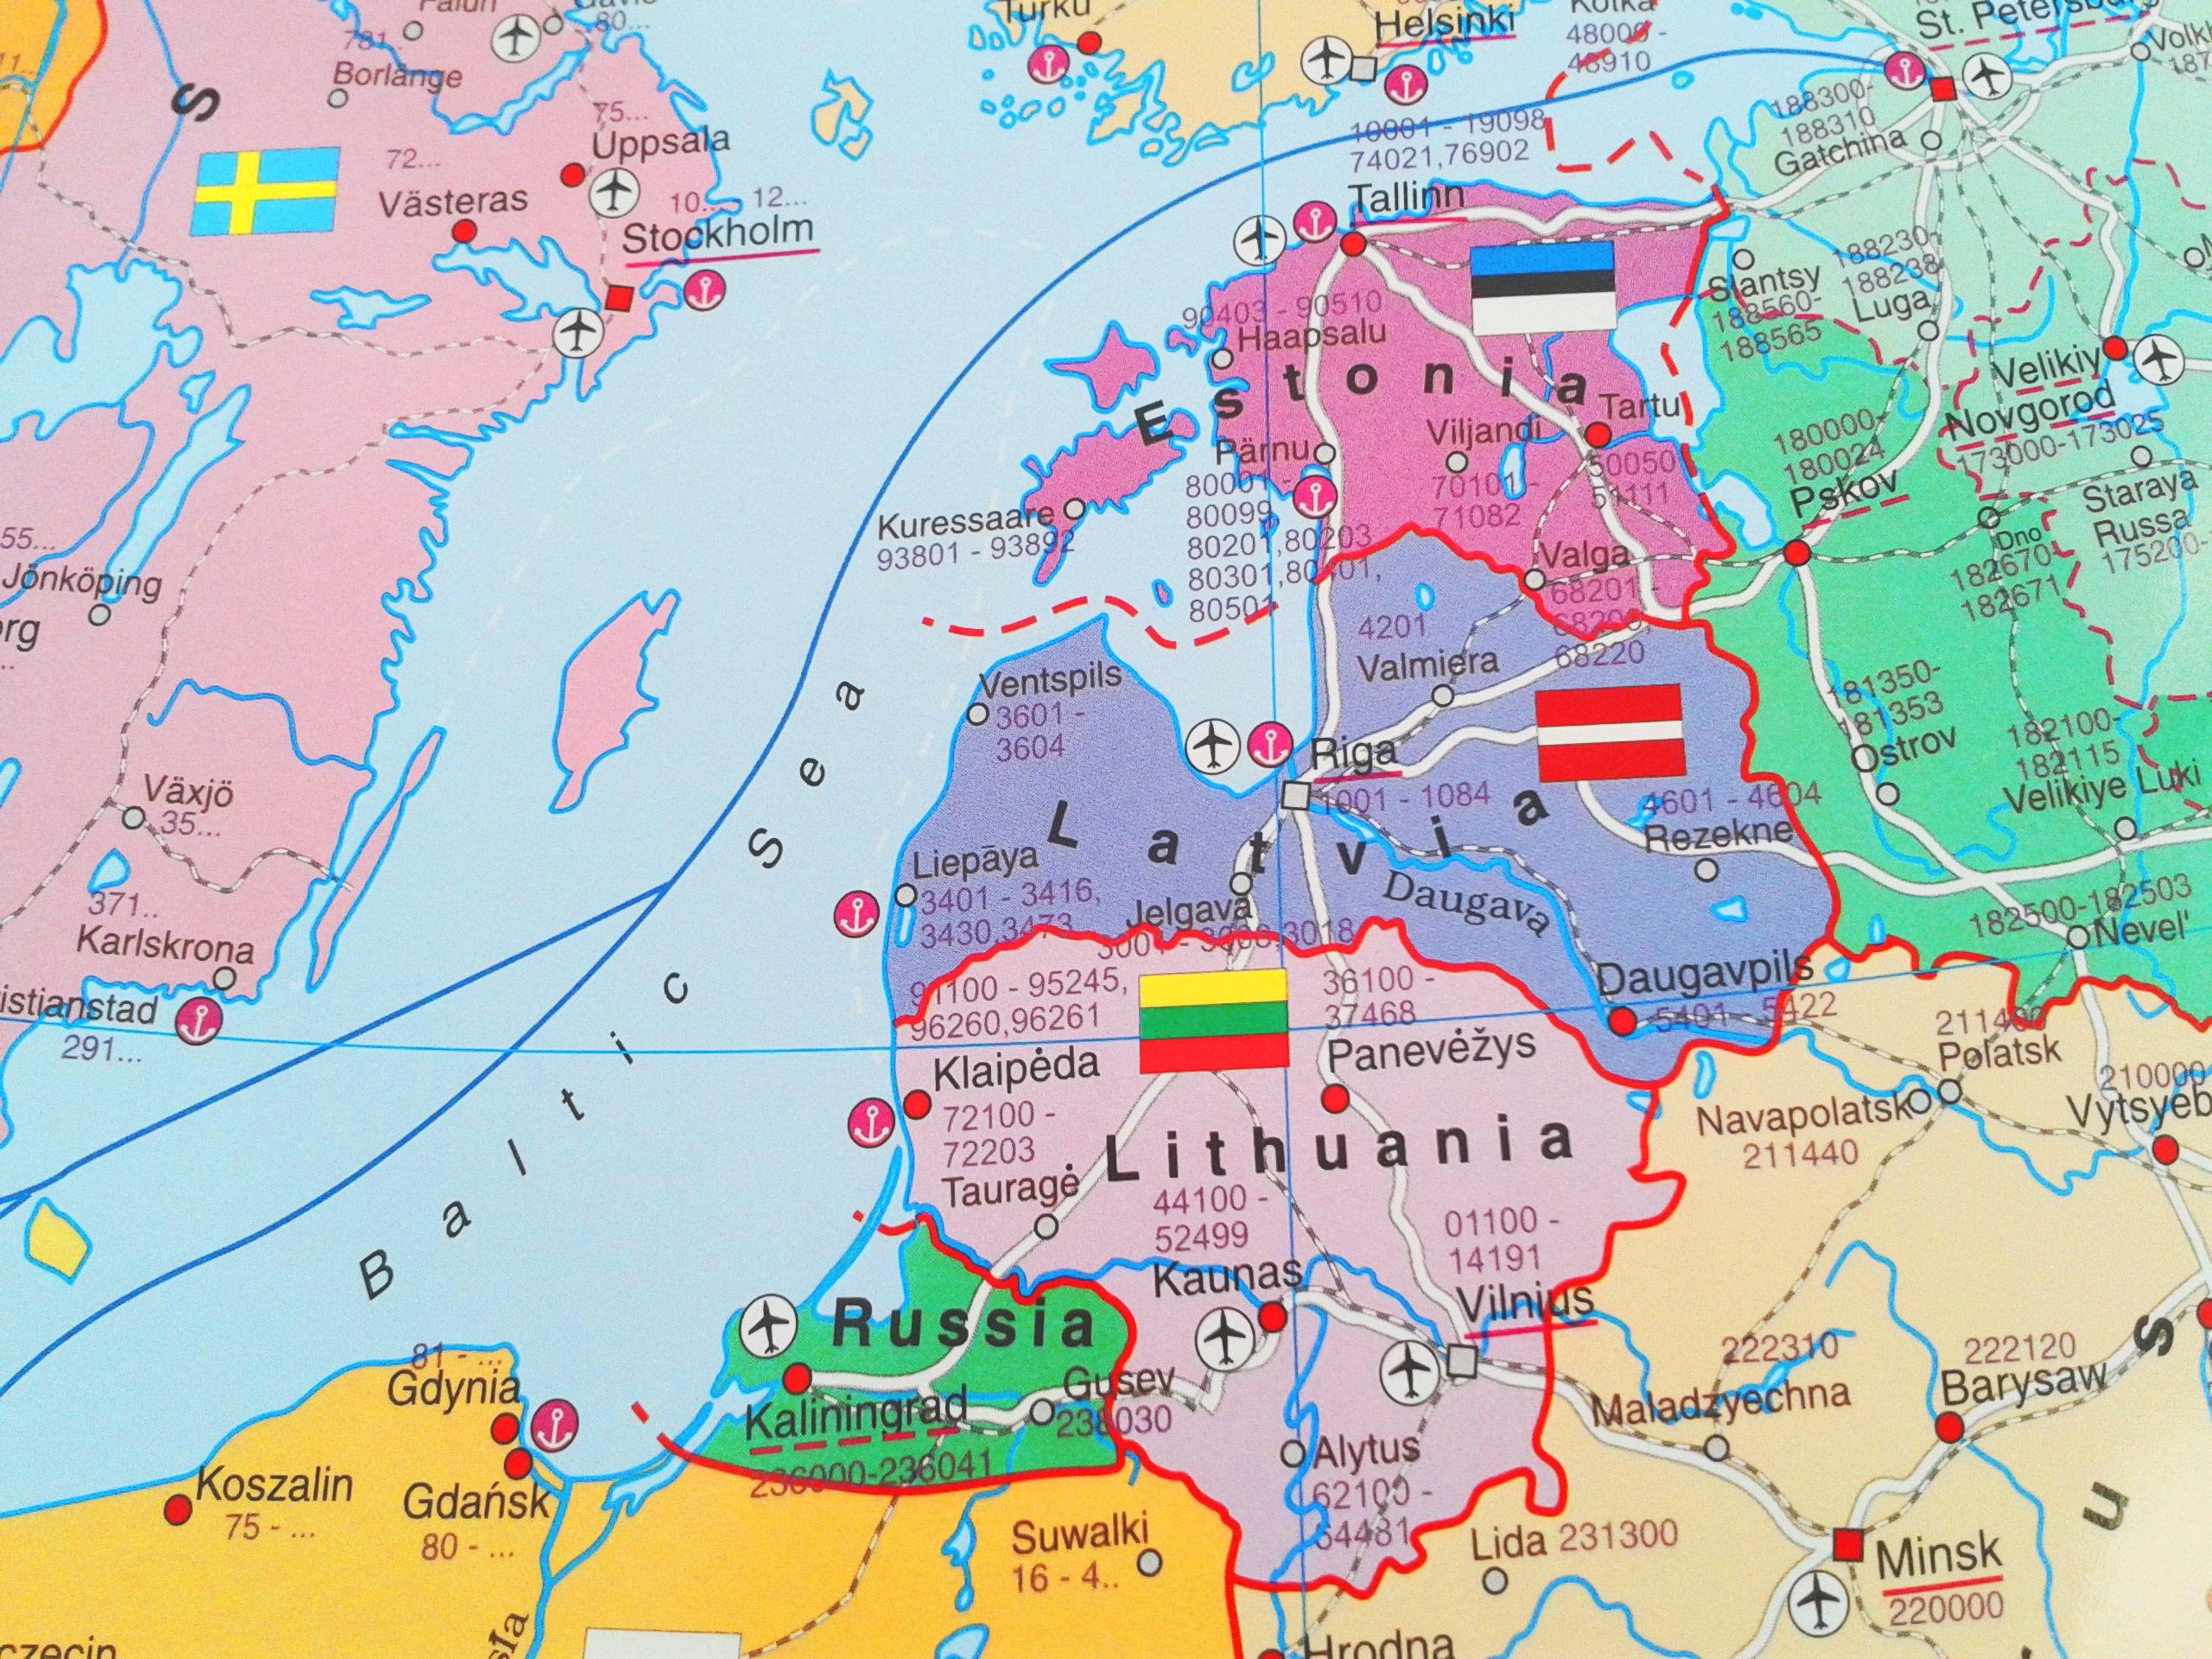 Harta tarilor baltice | Letonia ⓜ mapamond media